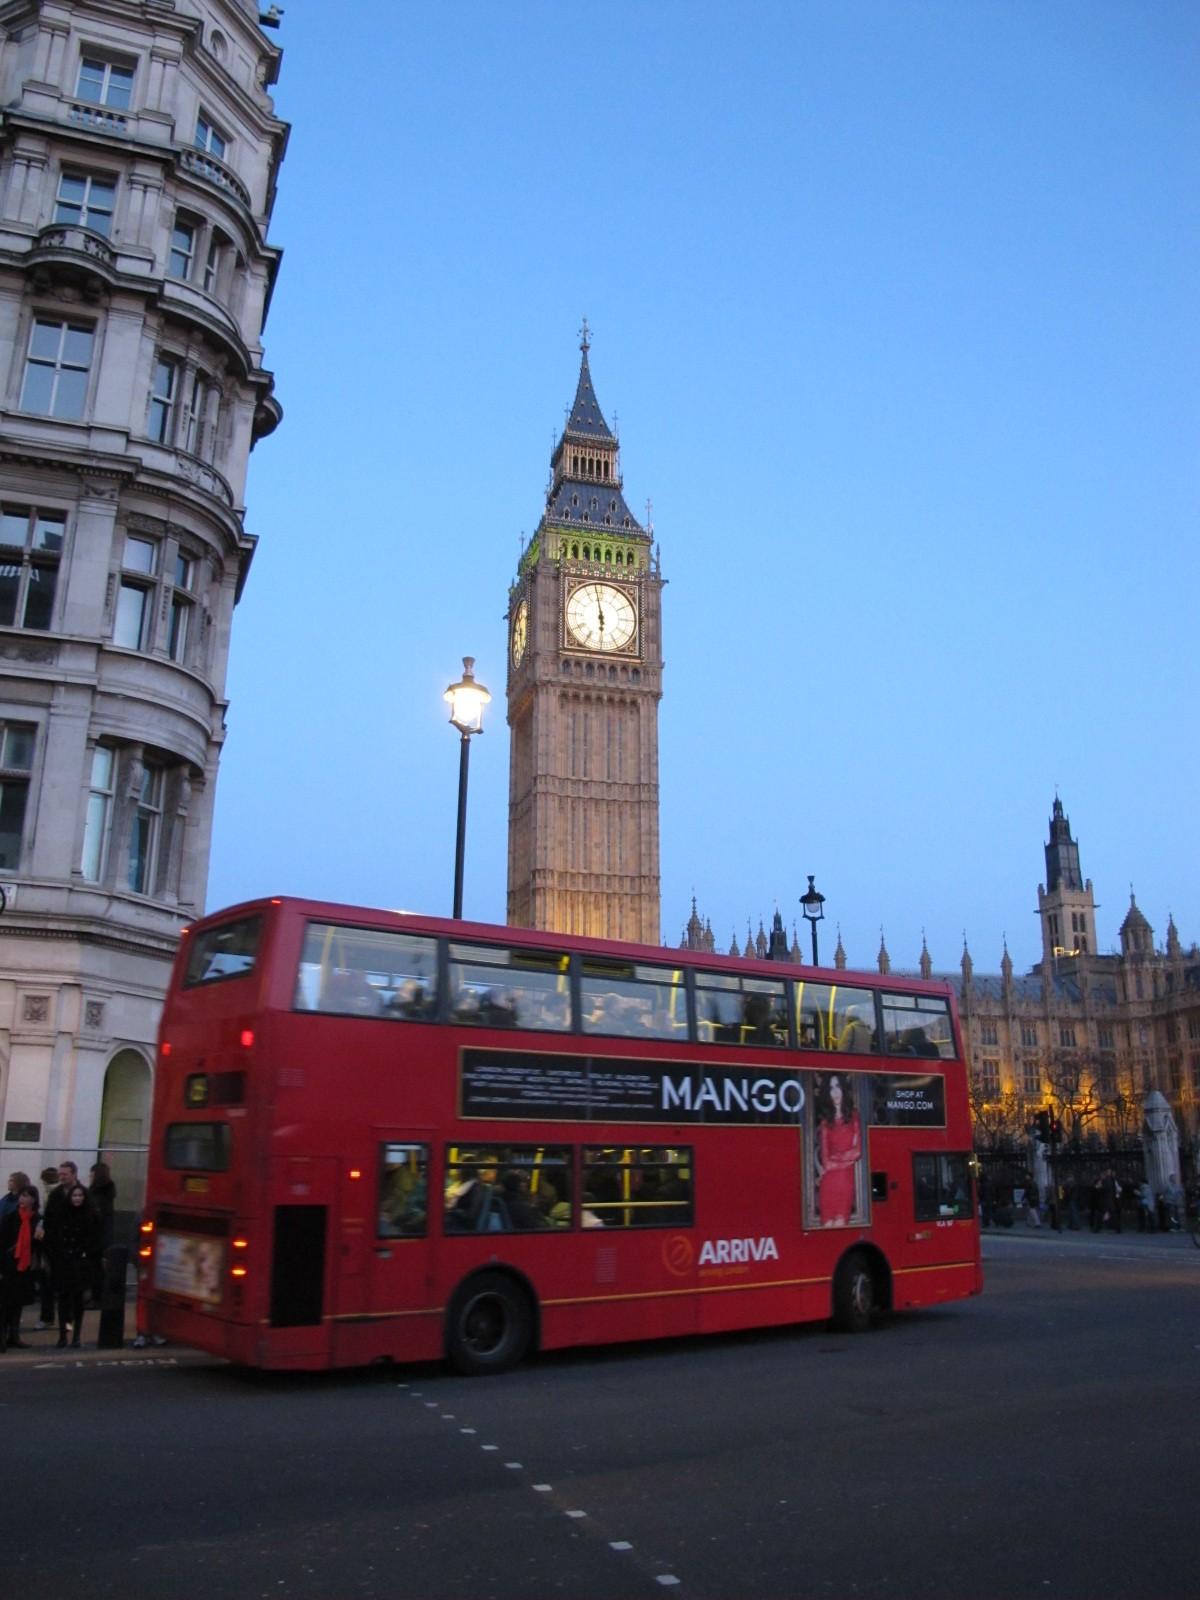 London-2012-big-ben-and-bus-night